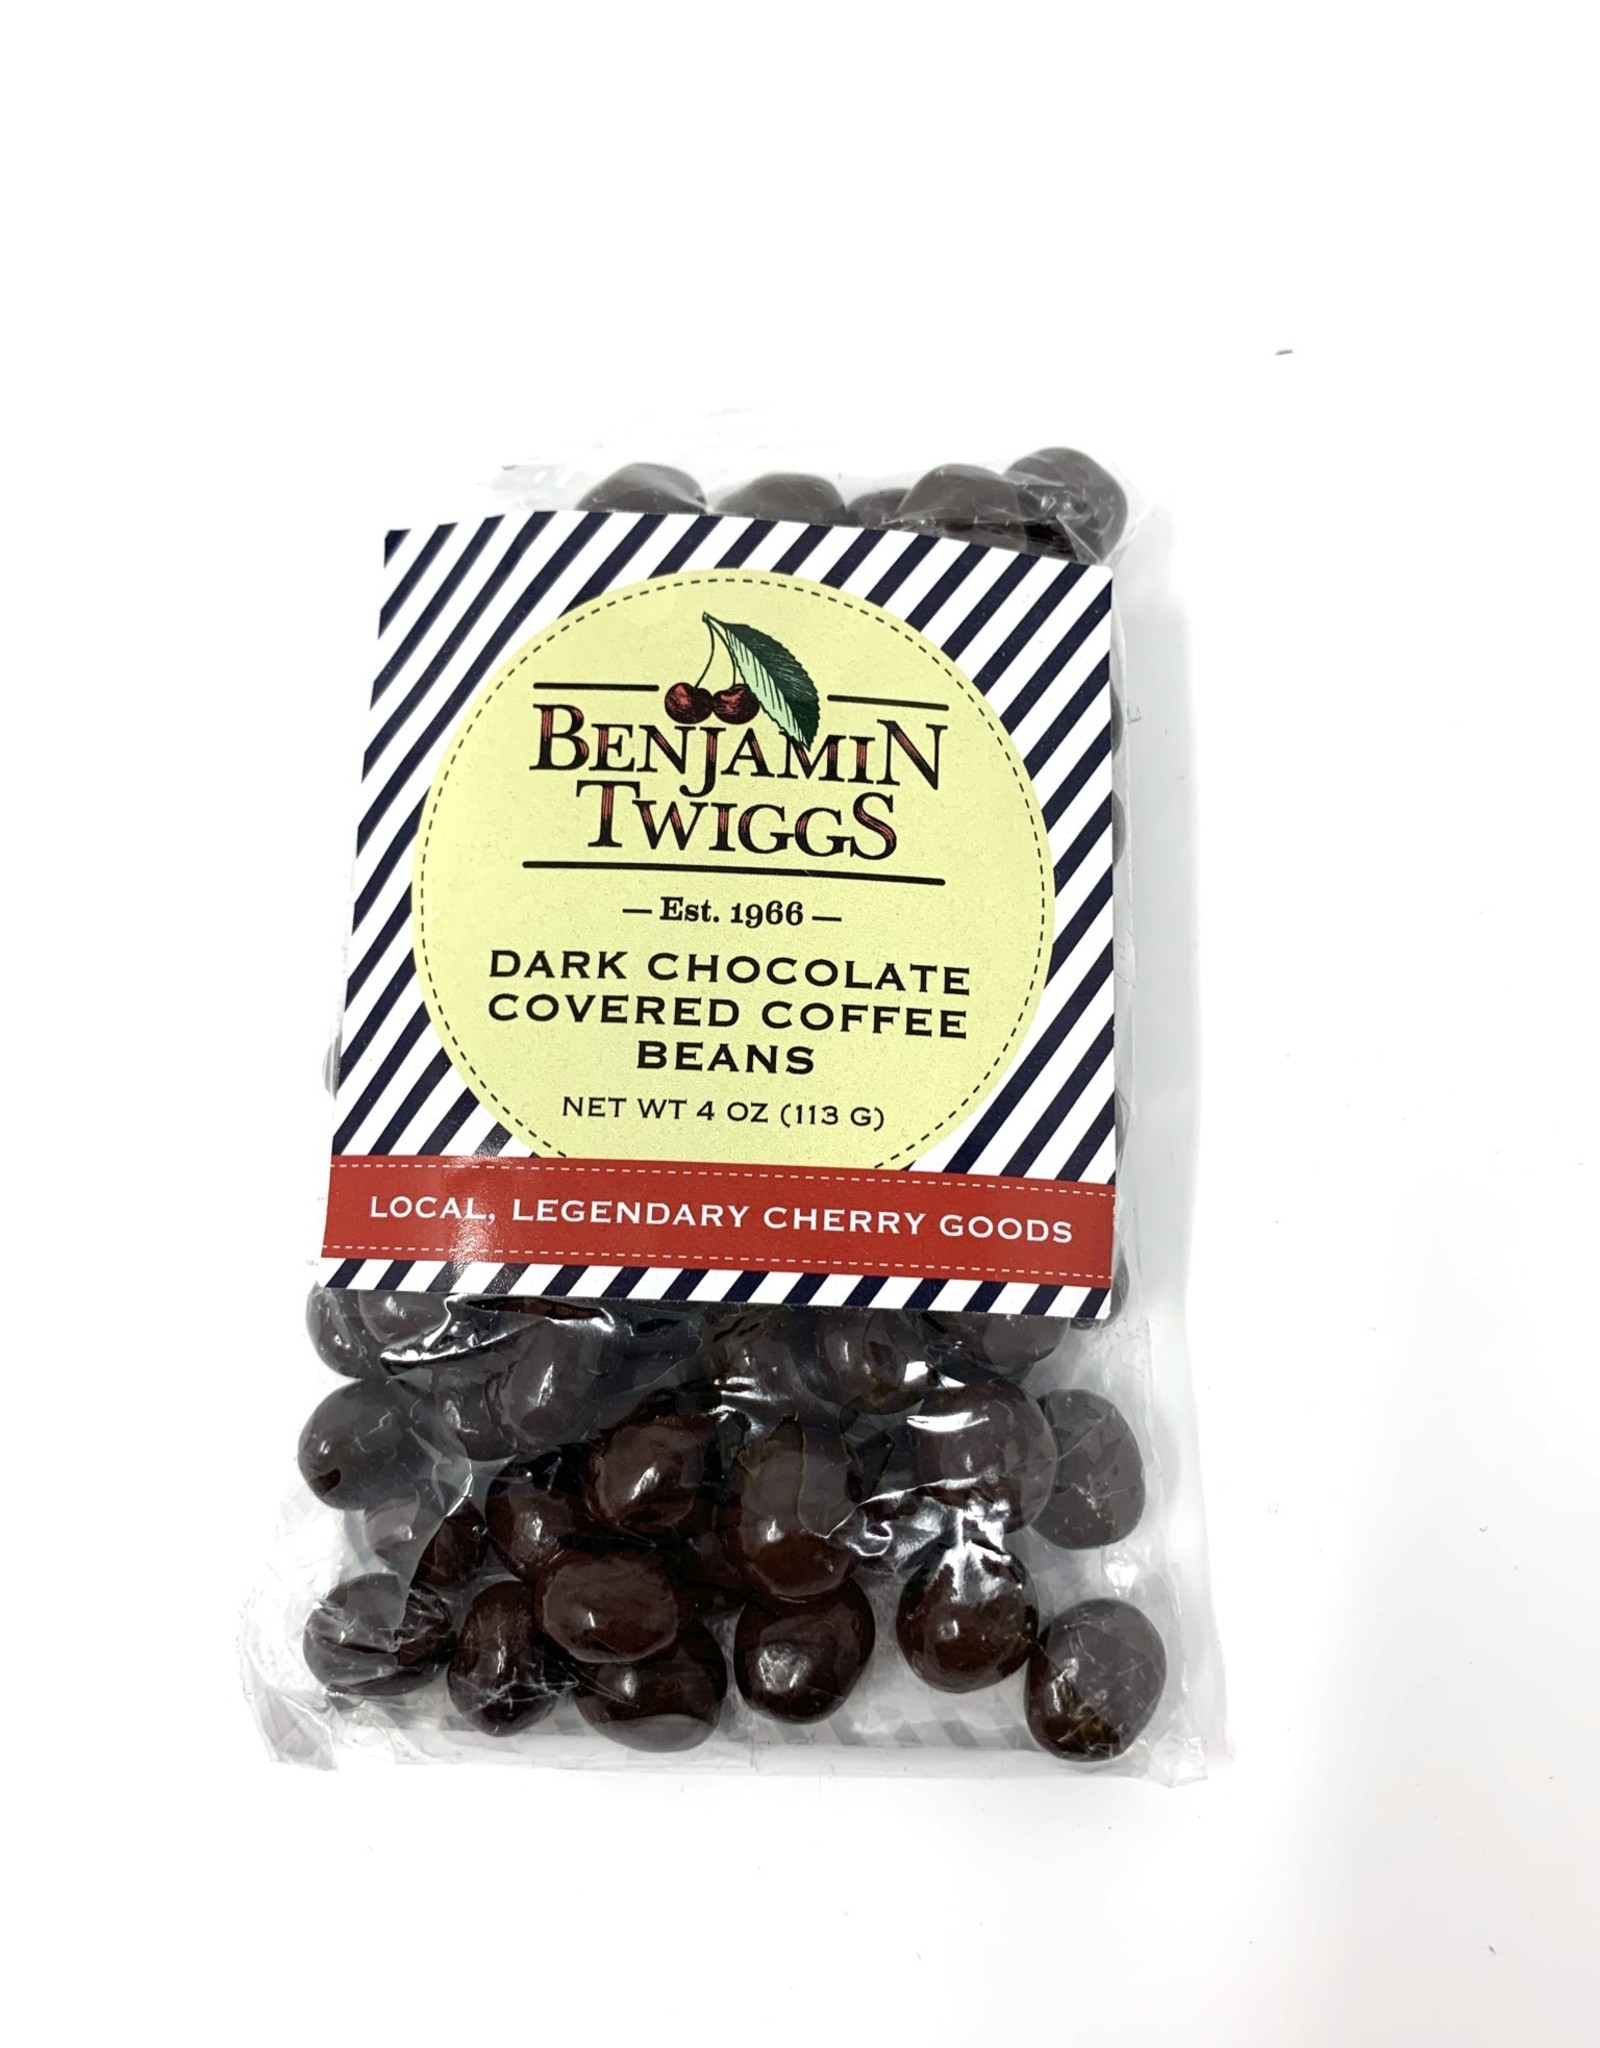 Benjamin Twiggs Dark Chocolate Covered Coffee Beans